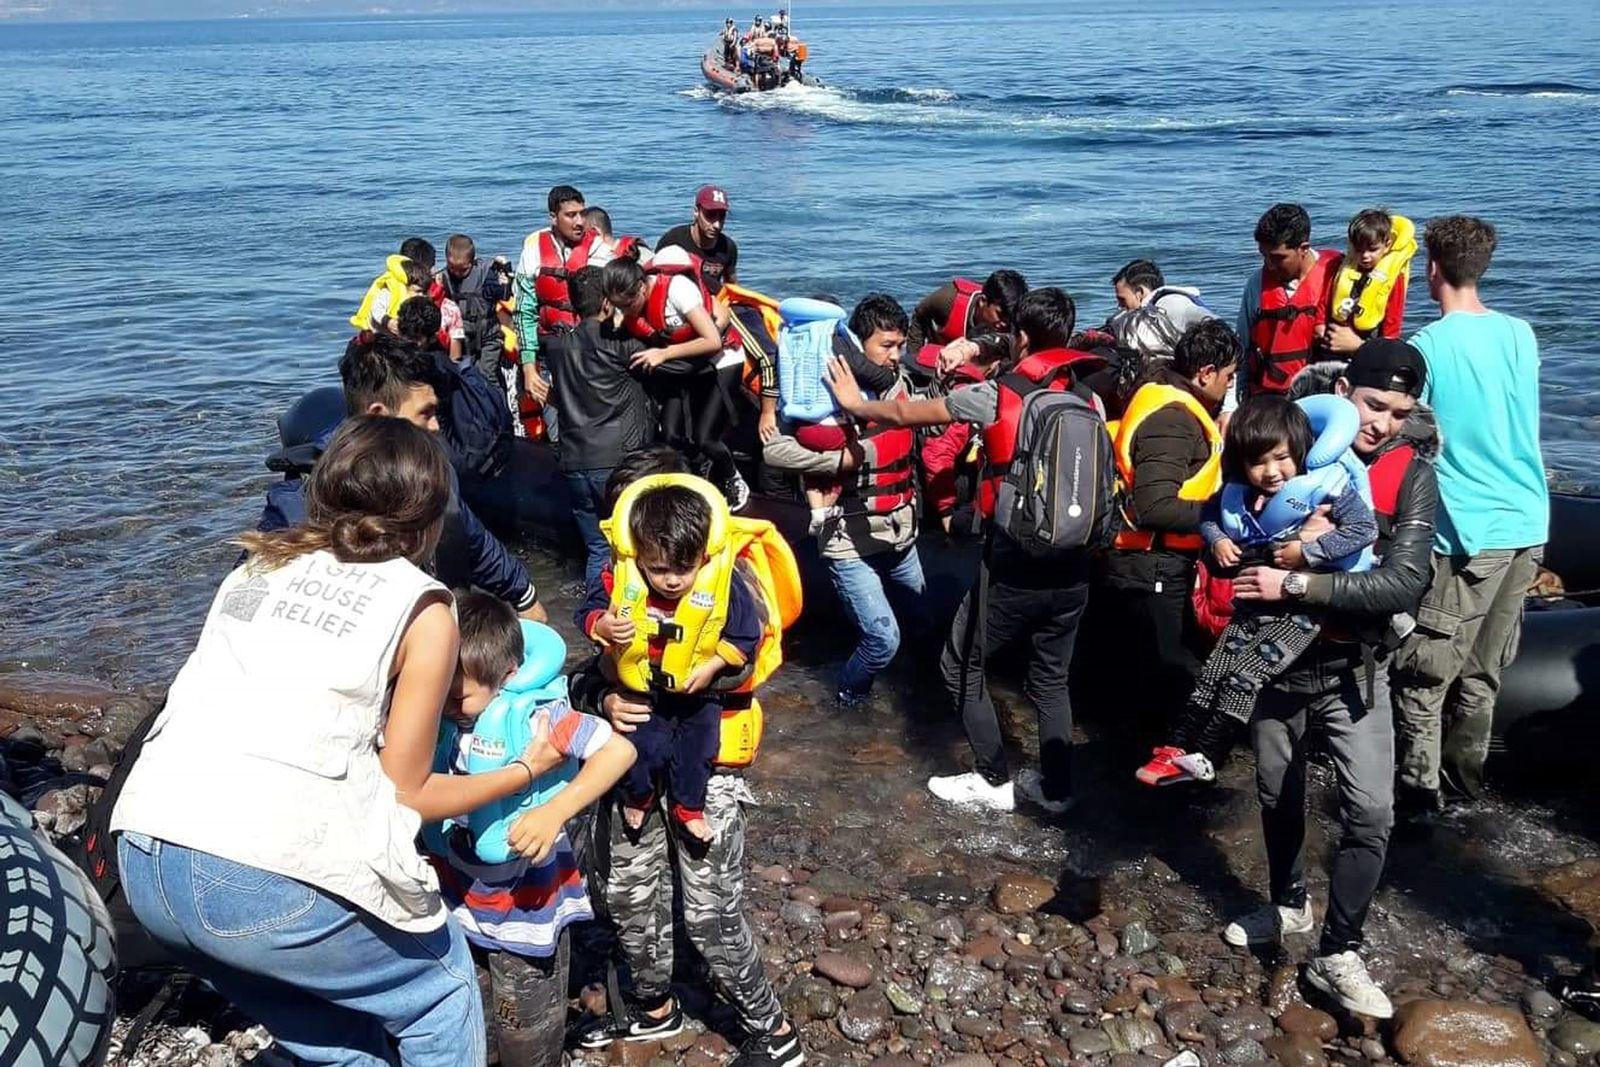 Griechenland/ Flüchtlinge